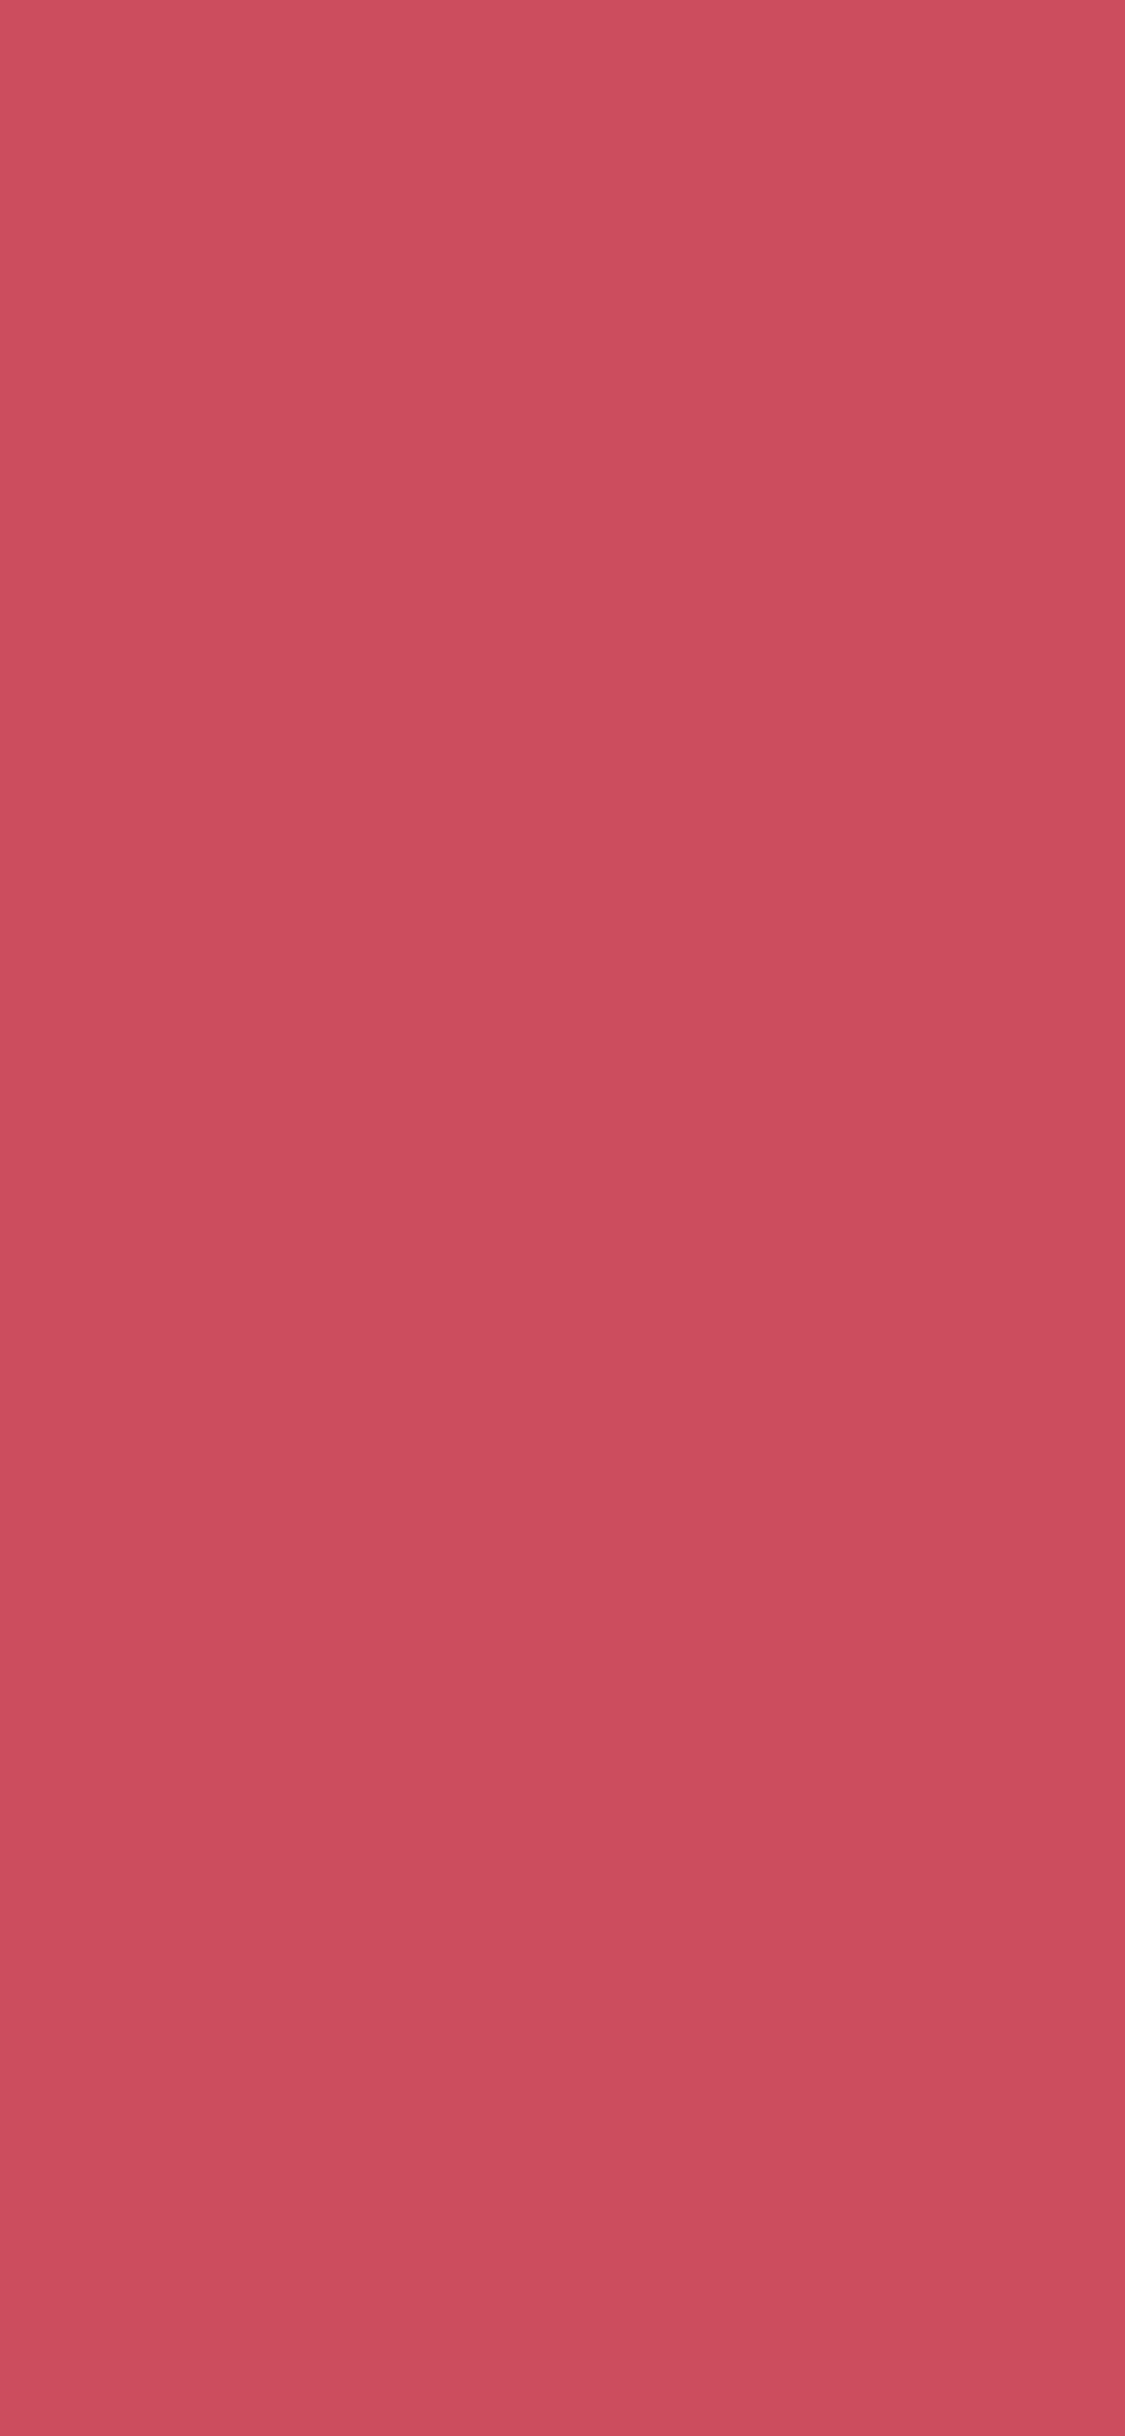 1125x2436 Dark Terra Cotta Solid Color Background